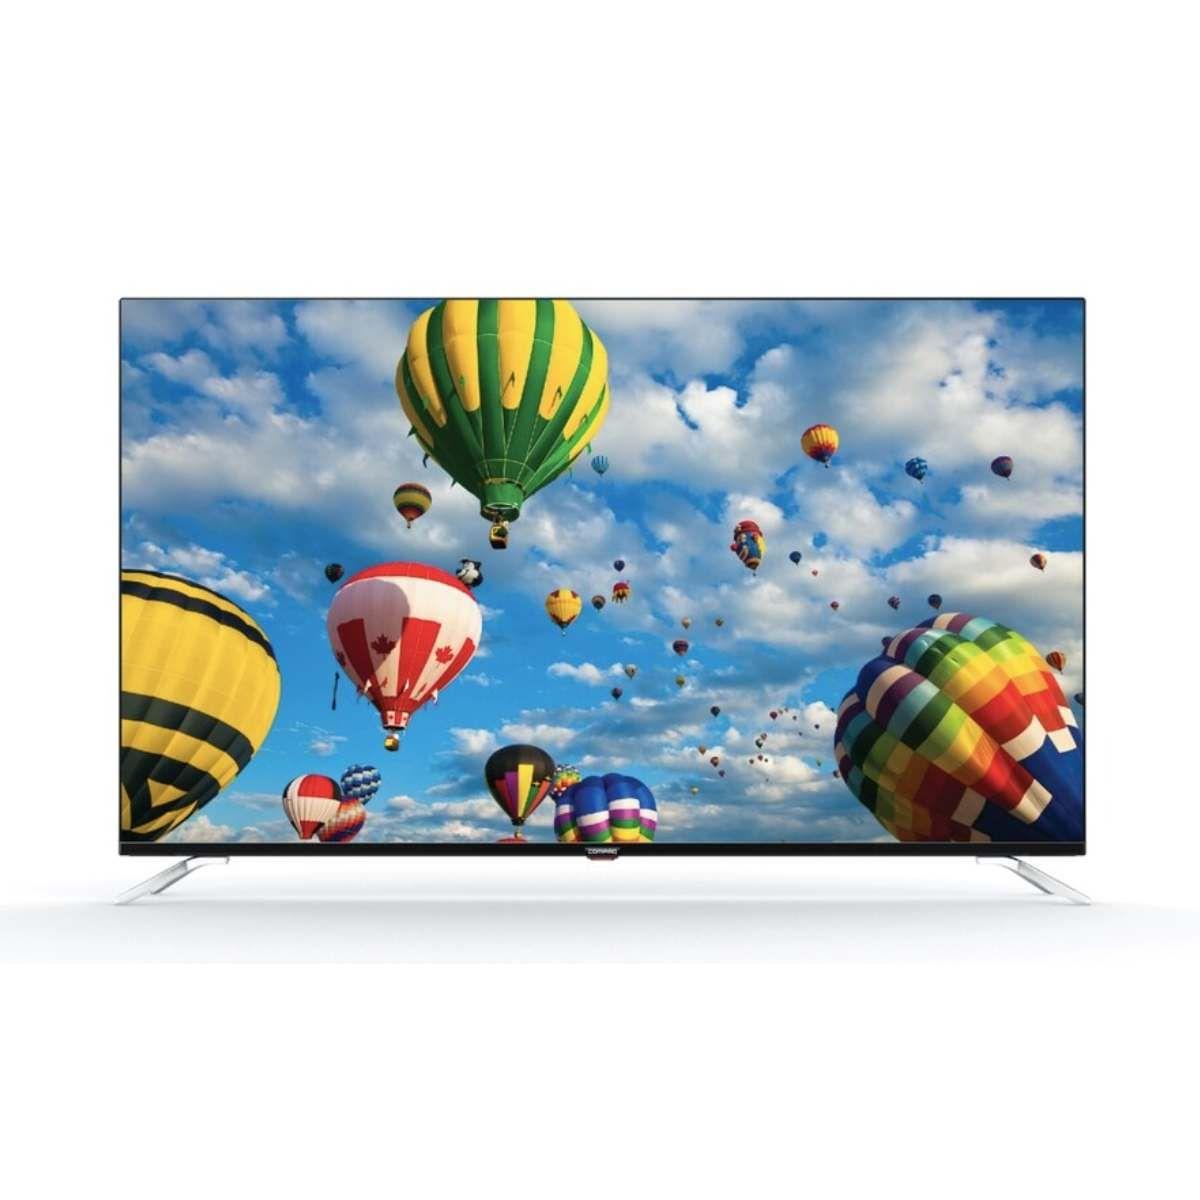 Compaq 65-inch HEX 4K QLED टीवी